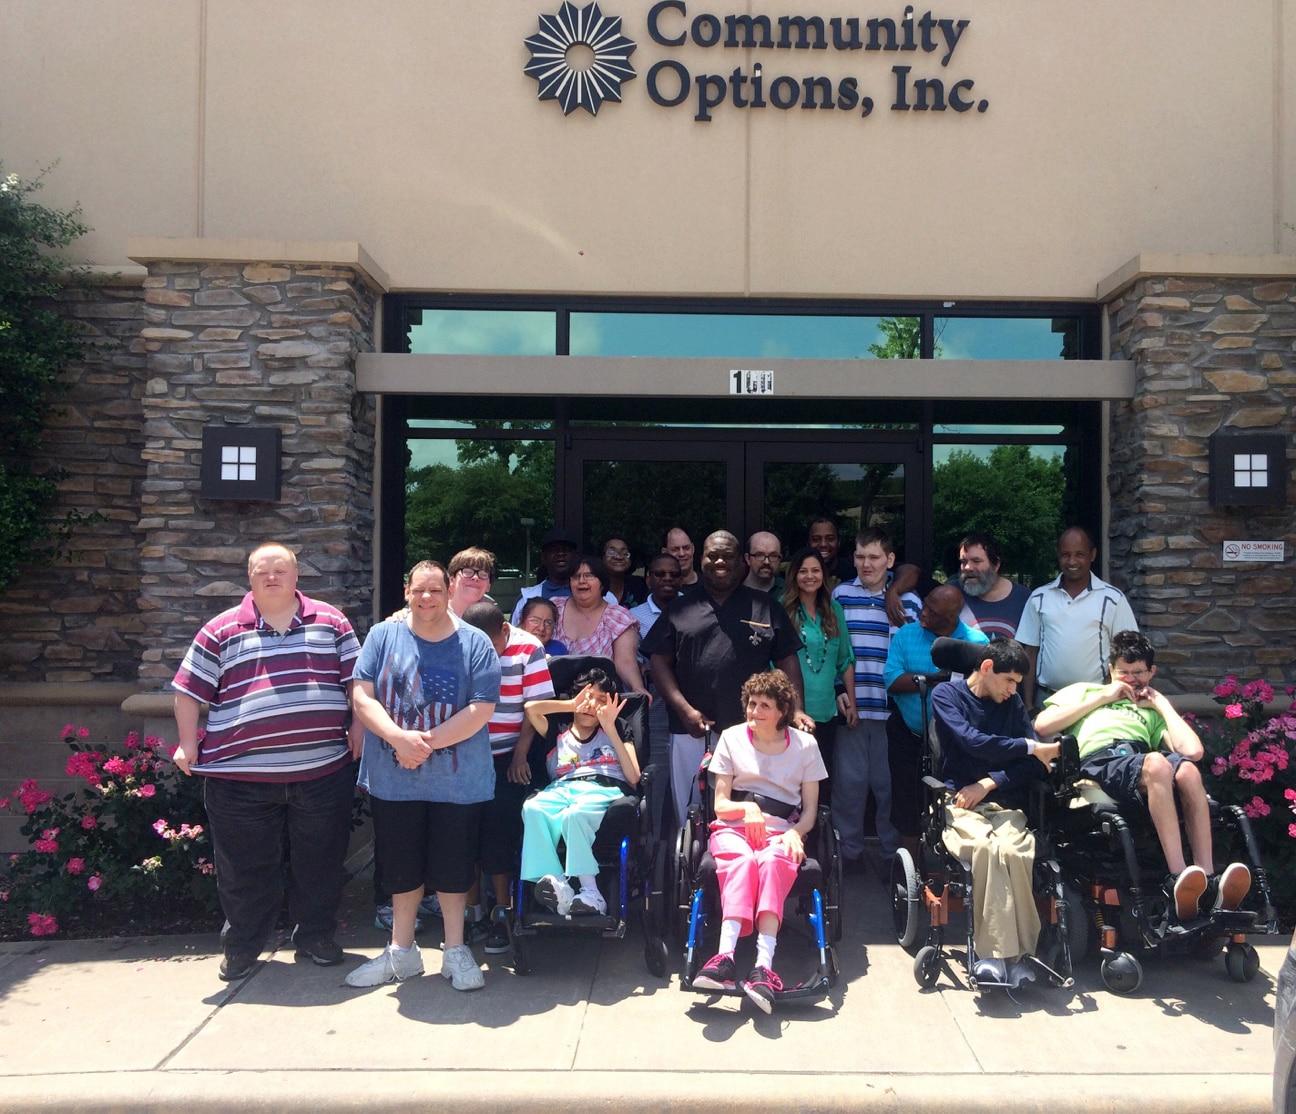 Community Options, Inc. of Dallas, TX.